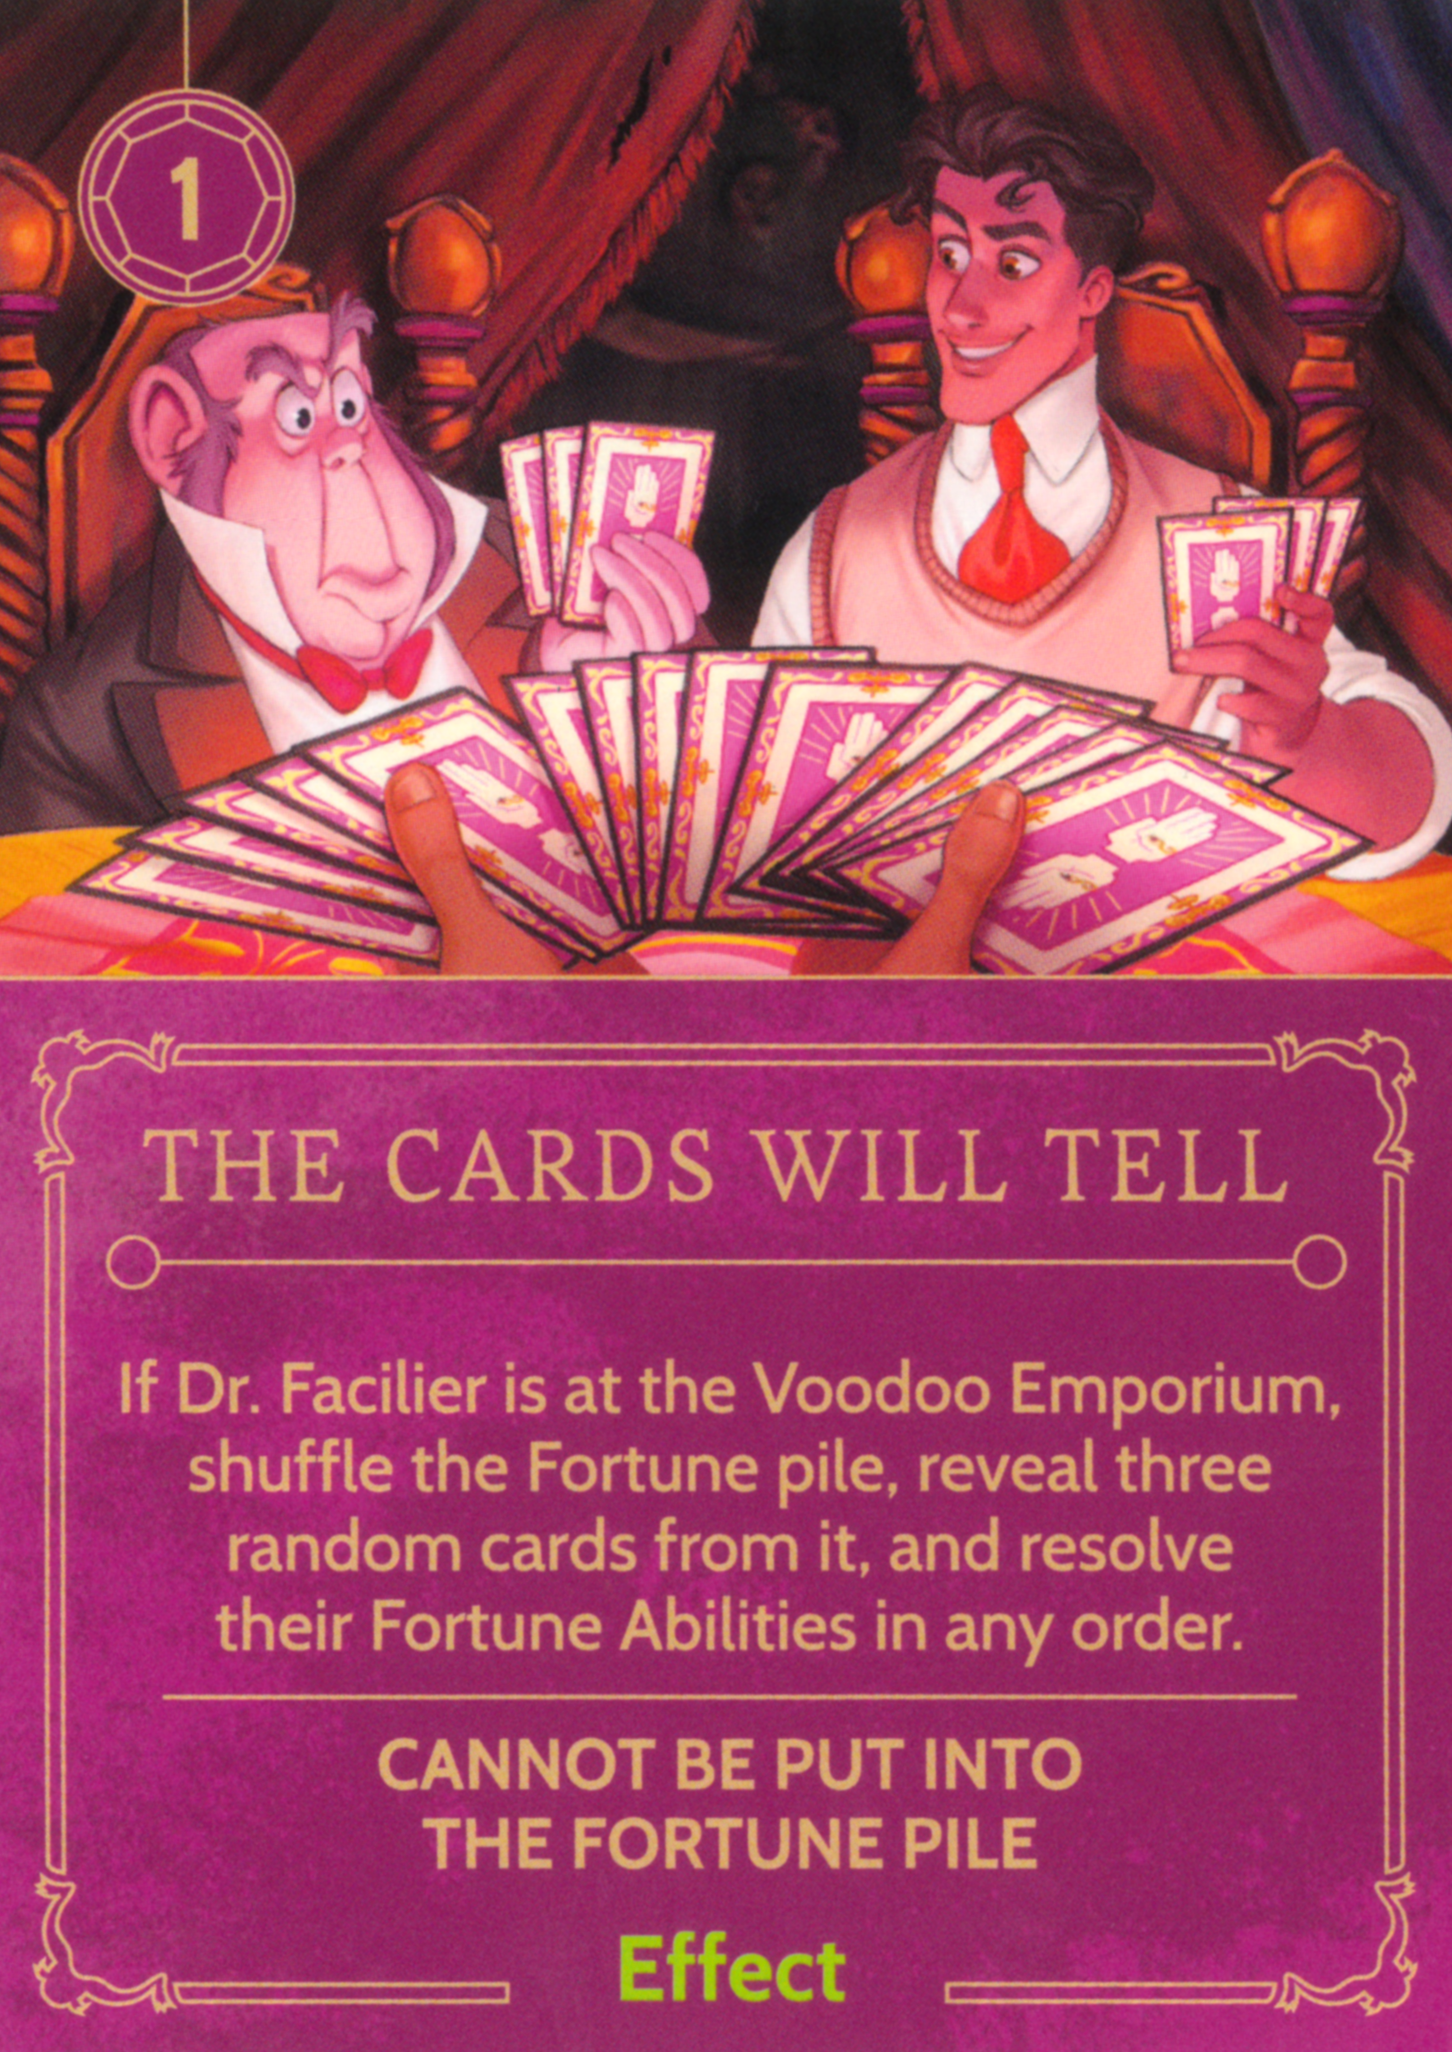 The Cards Will Tell | Disney Villainous Wiki | FANDOM